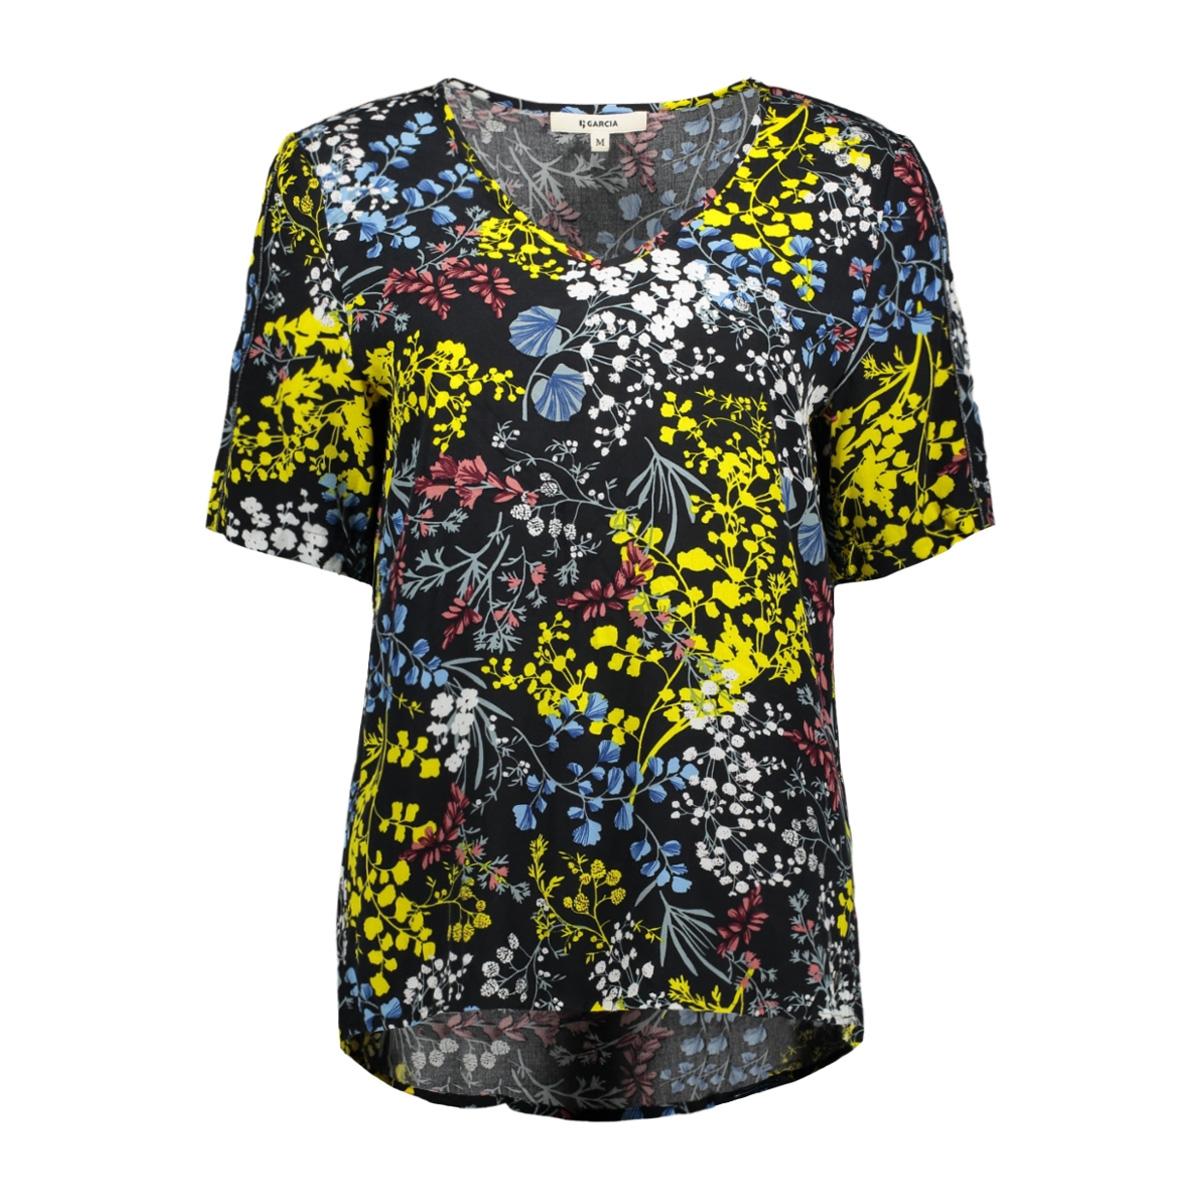 a90033 garcia t-shirt 292 dark moon